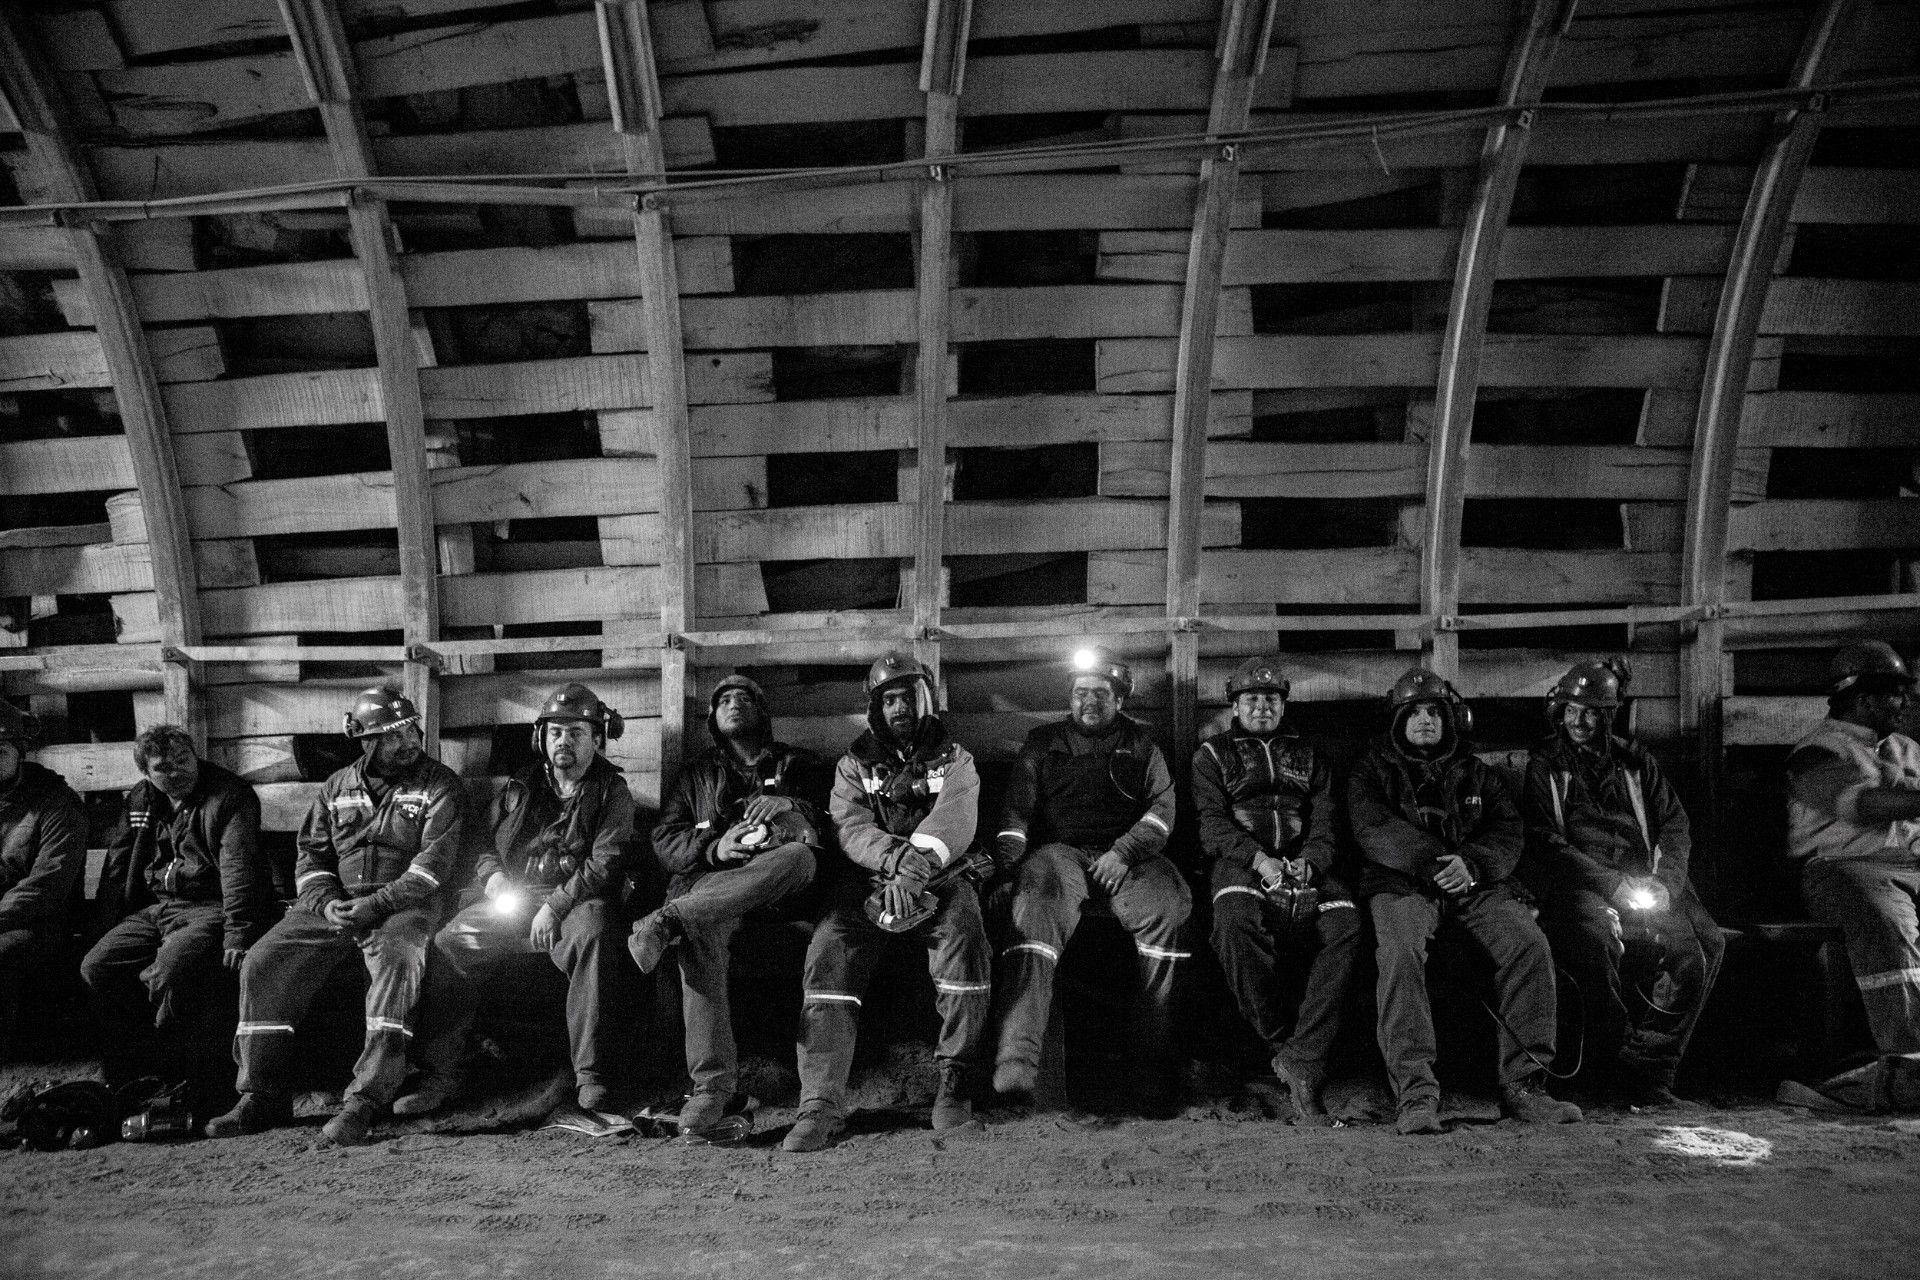 Trabajadores de la mina de Río Turbio. Foto: Viojf